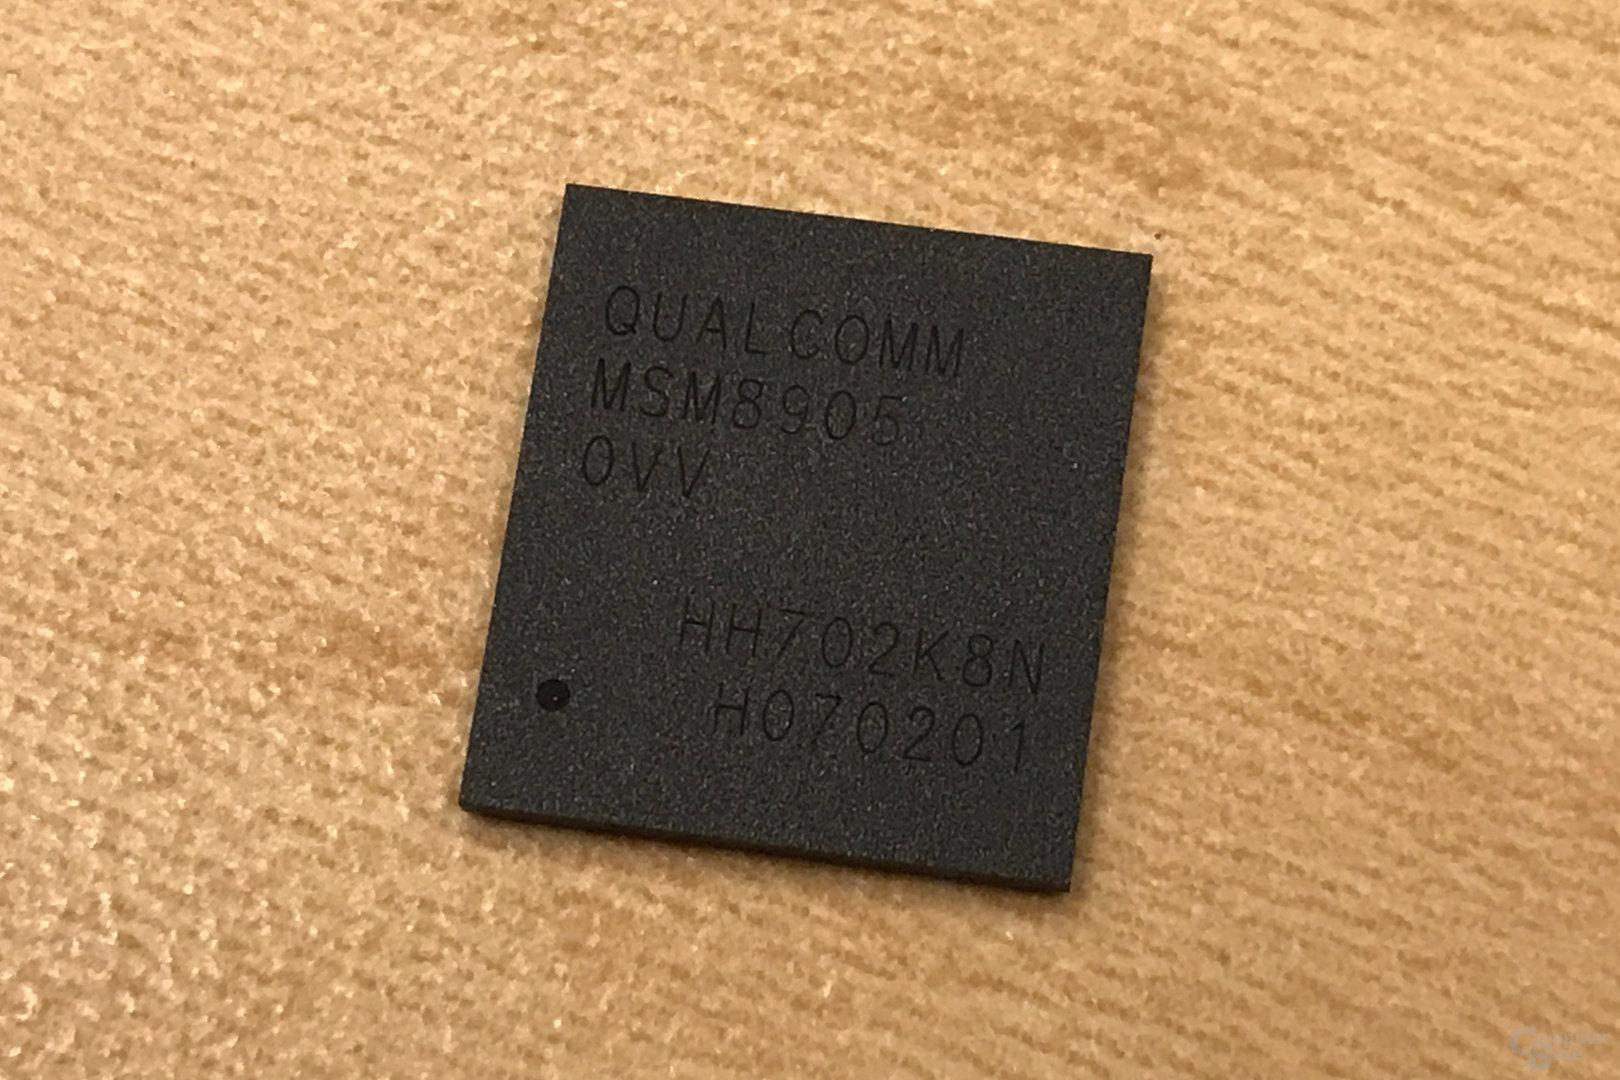 Qualcomm 205 Mobile Platform (MSM8905)